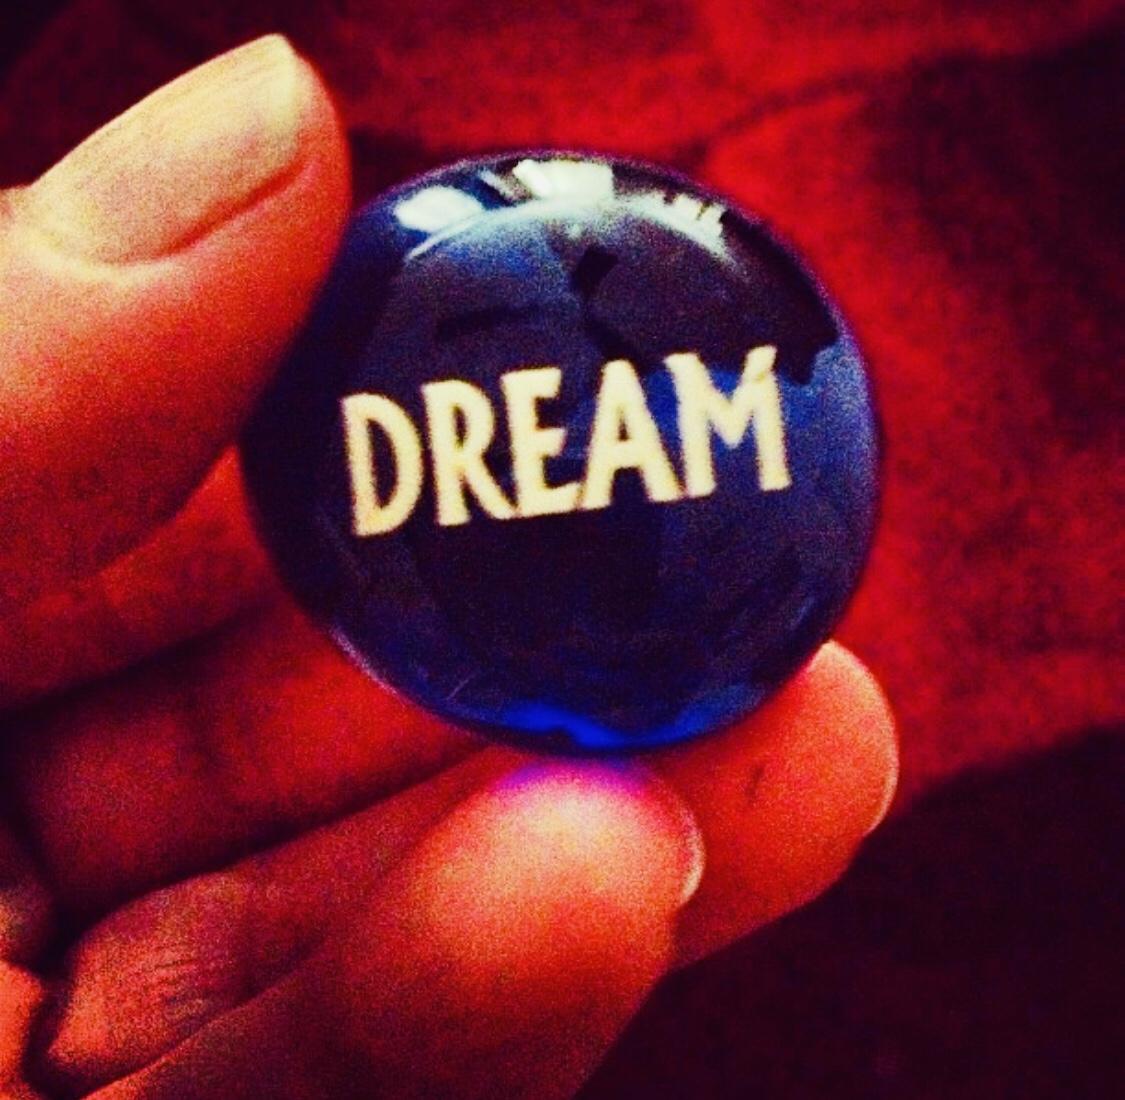 Dream a little dream, for big change.